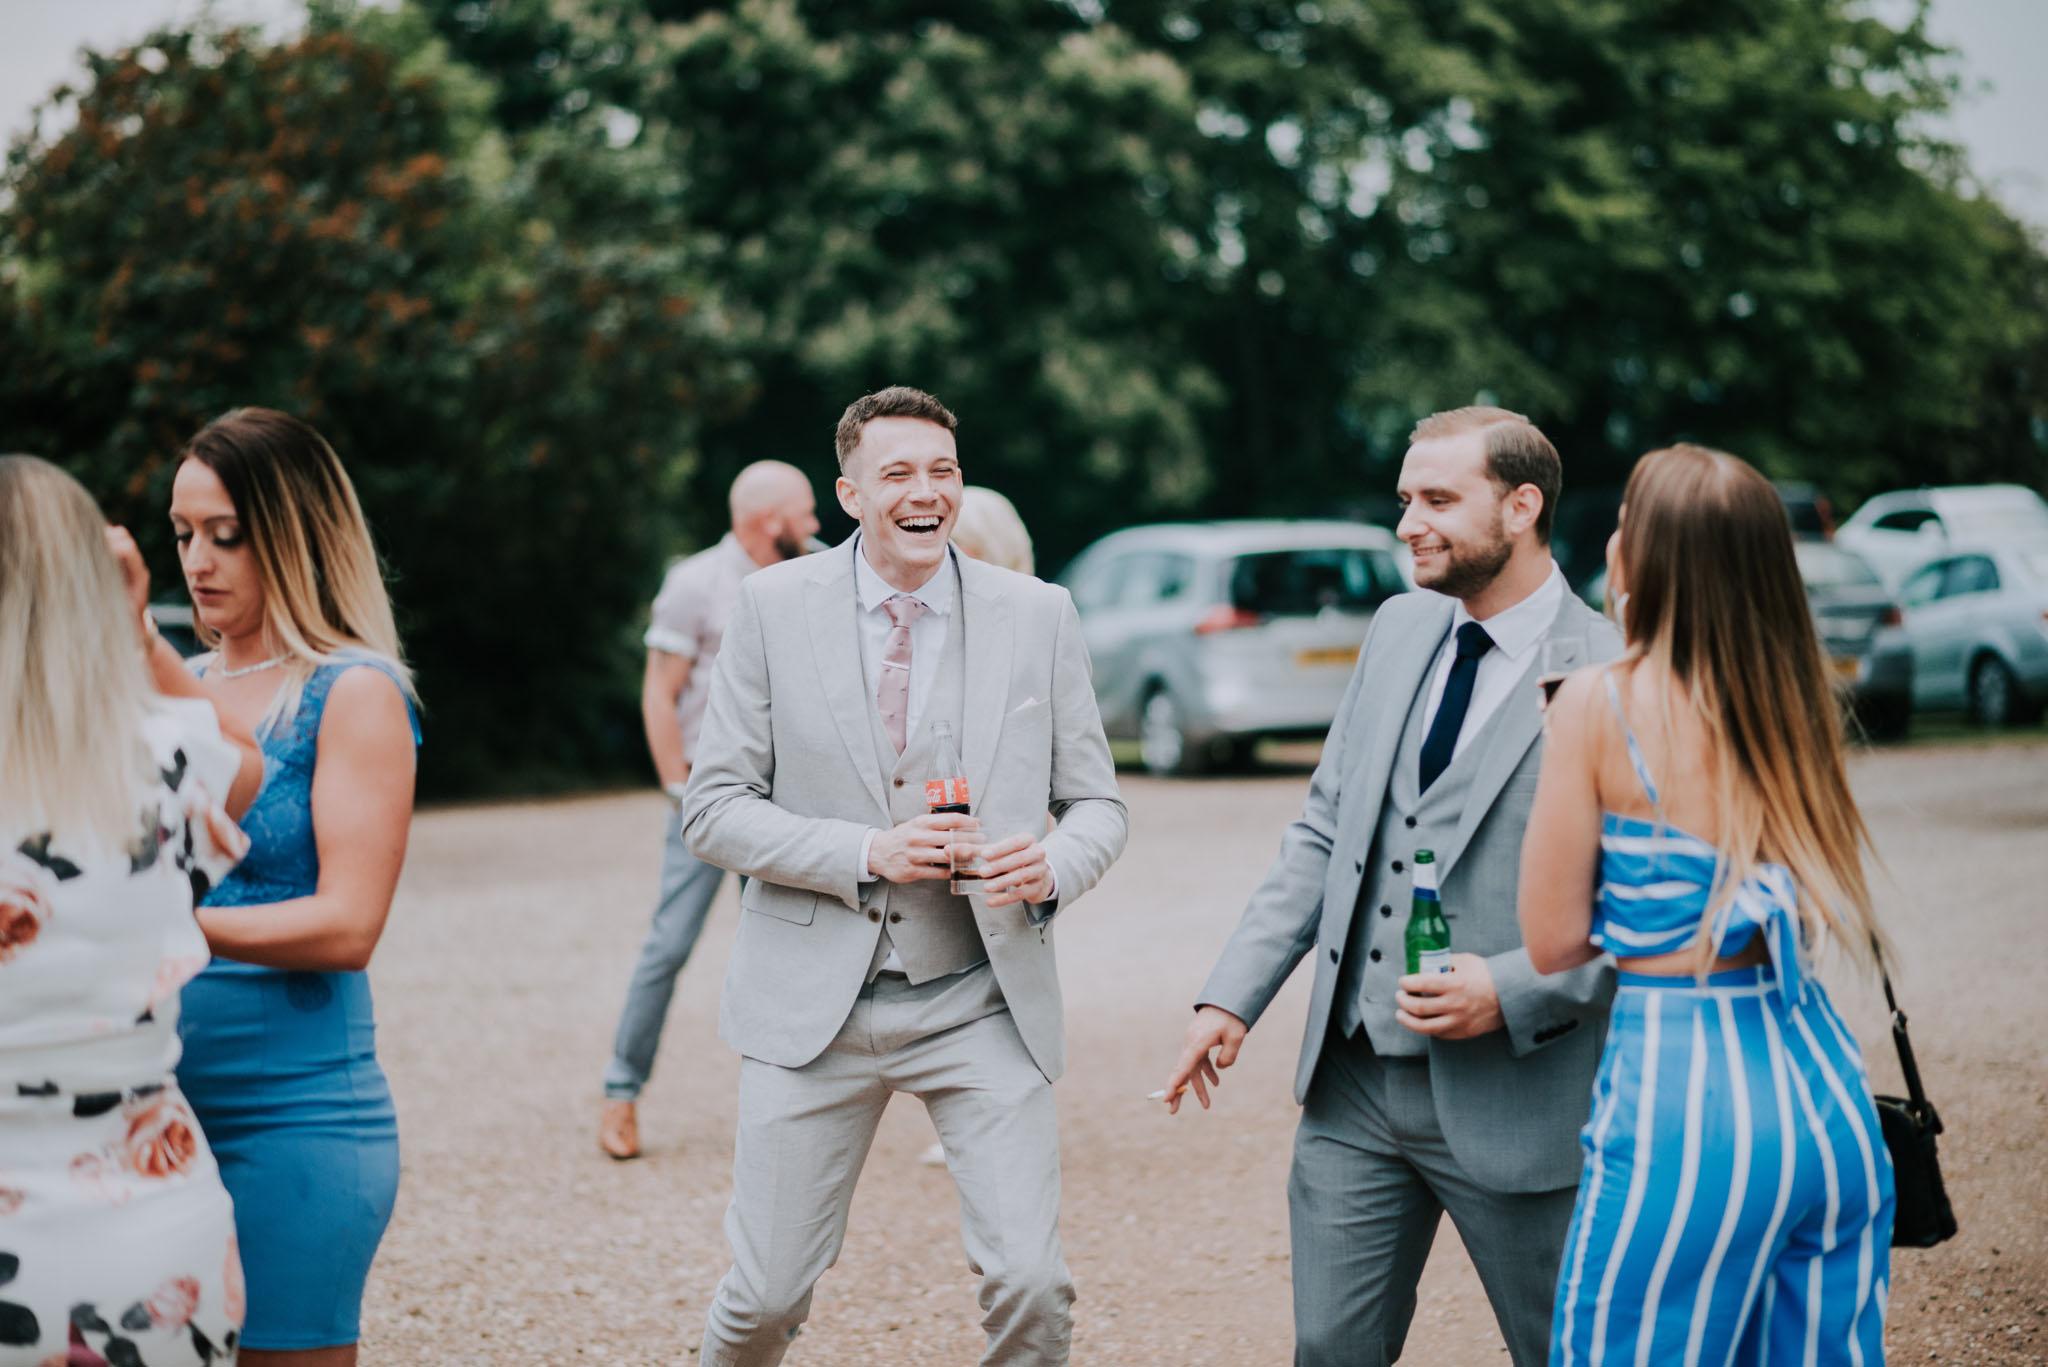 wedding-photographer-glewstone-court-hereford-scott-stockwell-photography472.jpg